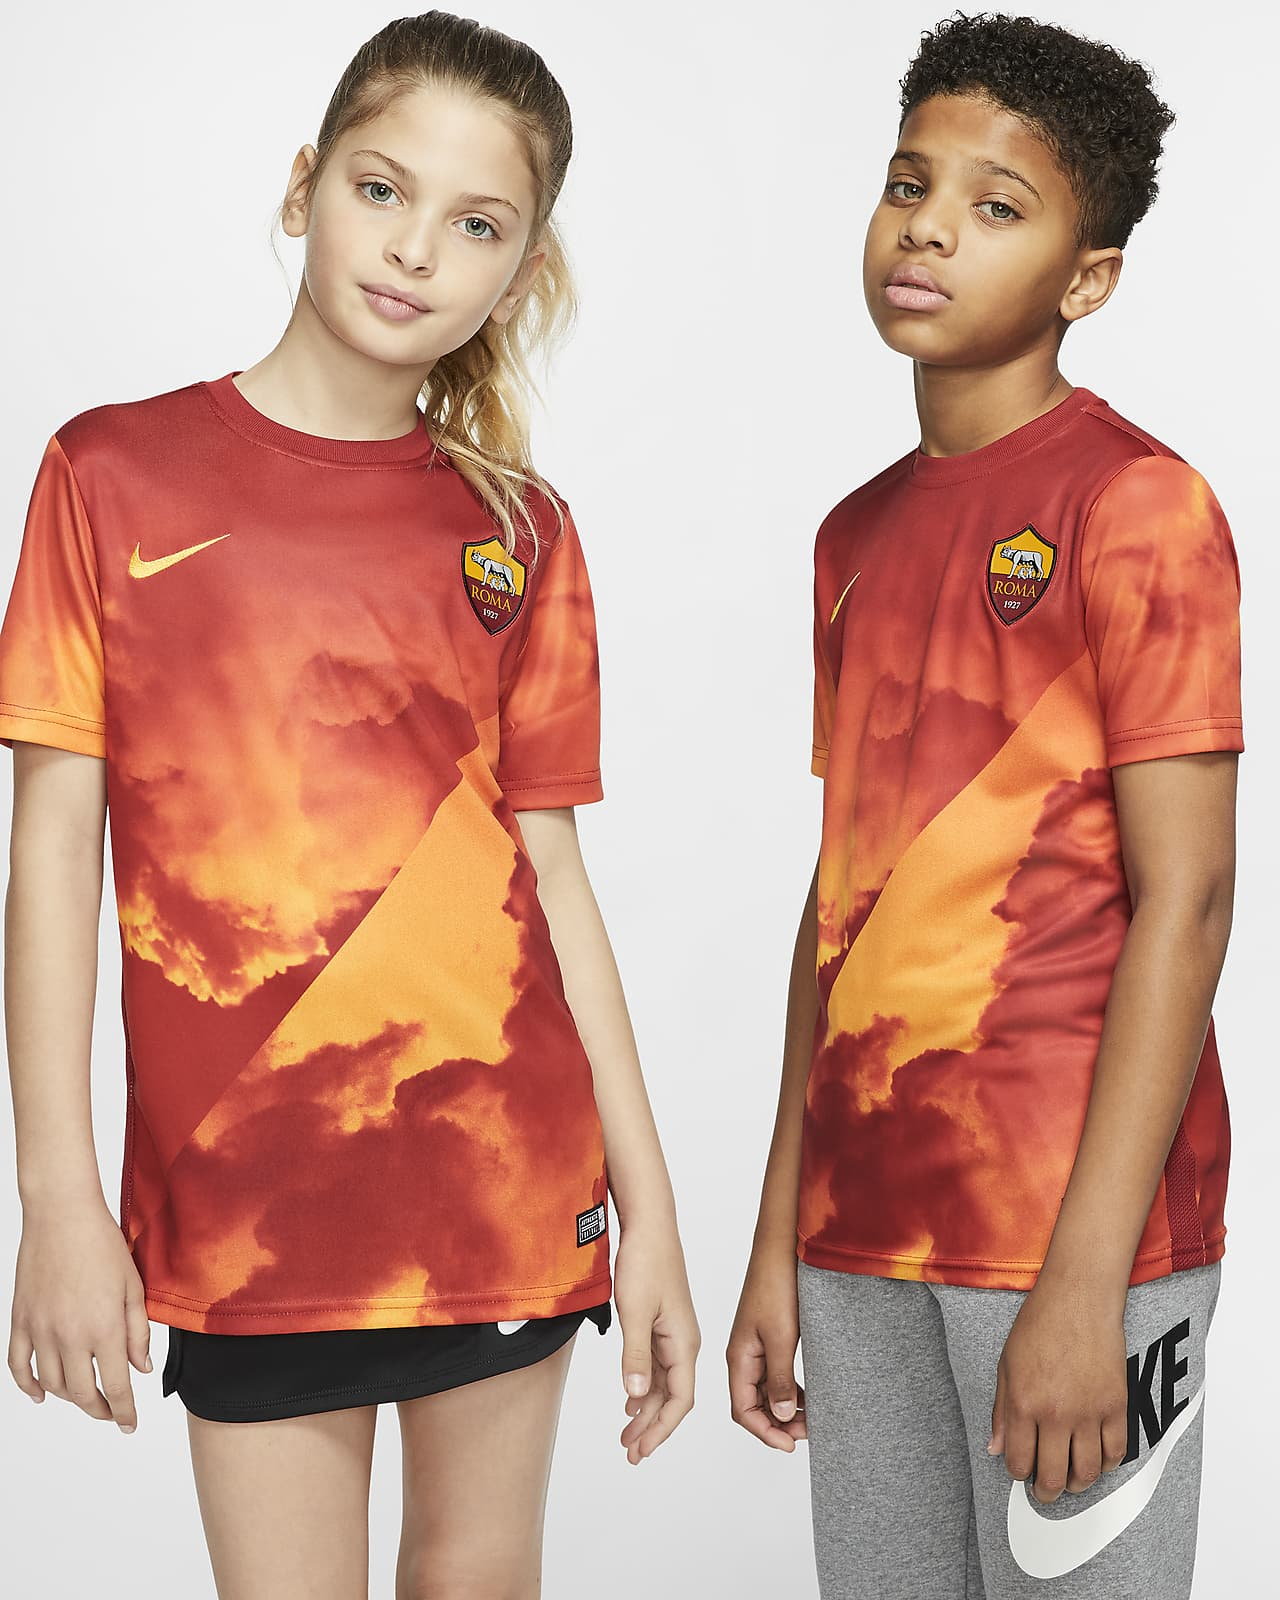 A.S. Roma Kids' Short-Sleeve Football Top